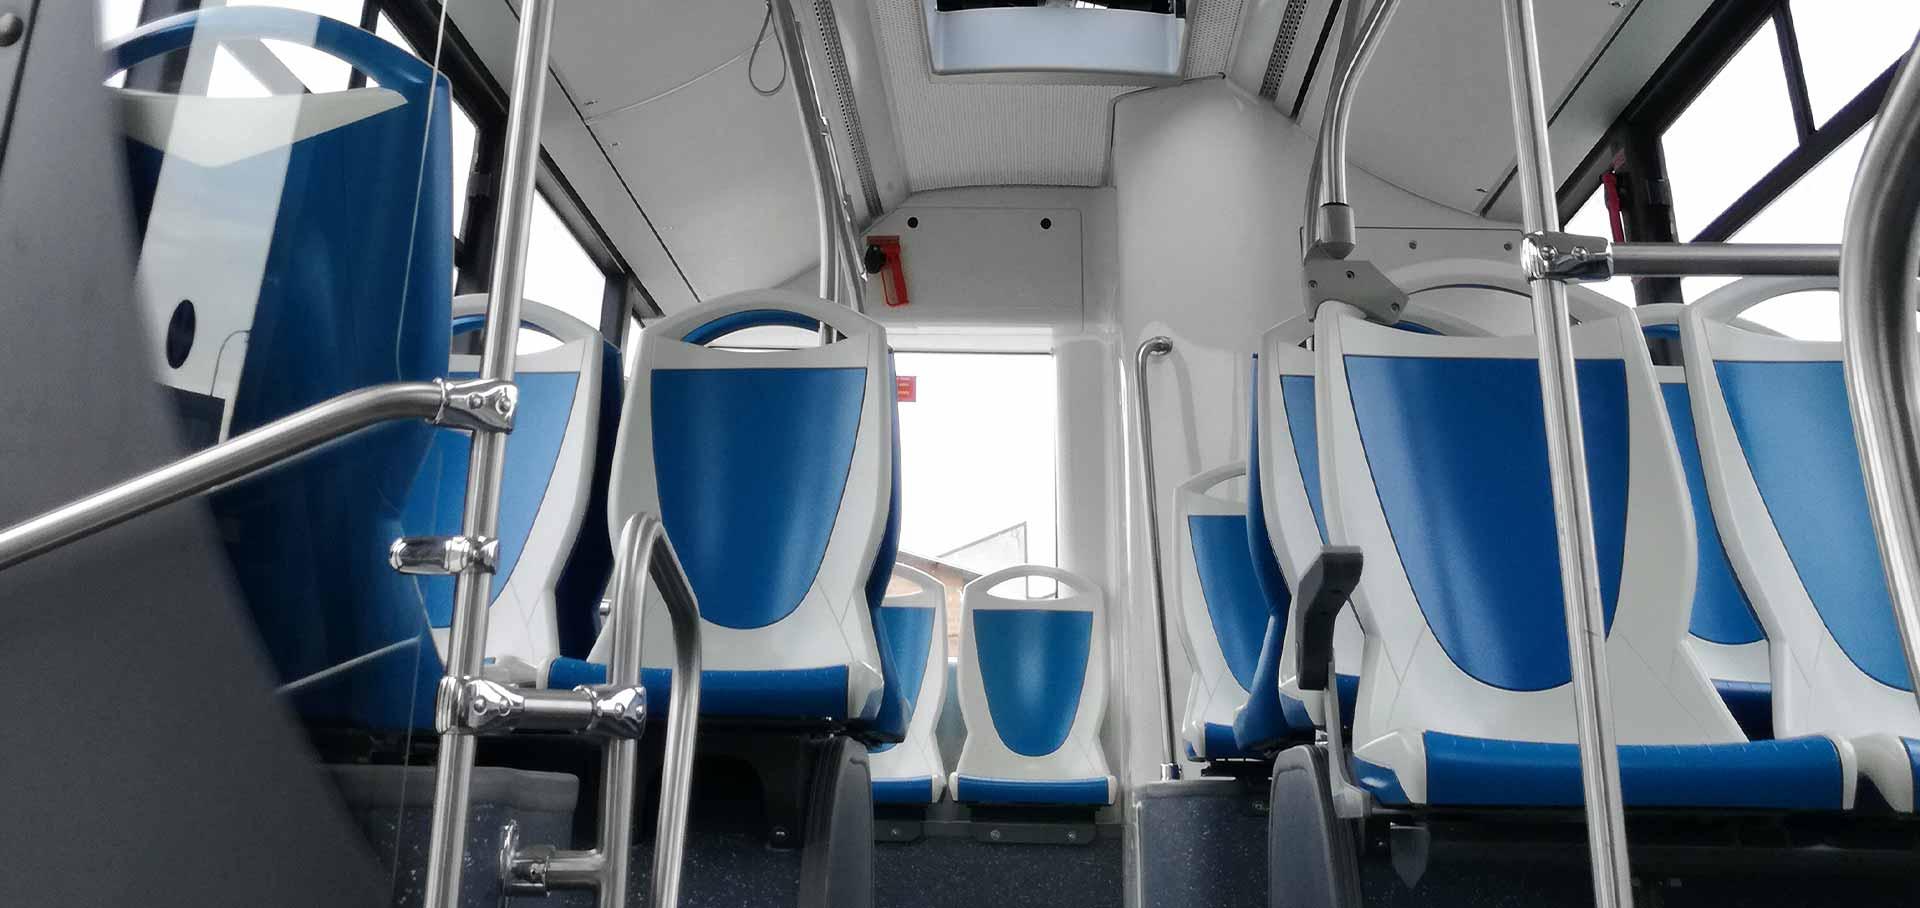 https://www.industriaitalianaautobus.com/wp-content/uploads/2021/05/bg-citymood-10-1.jpg